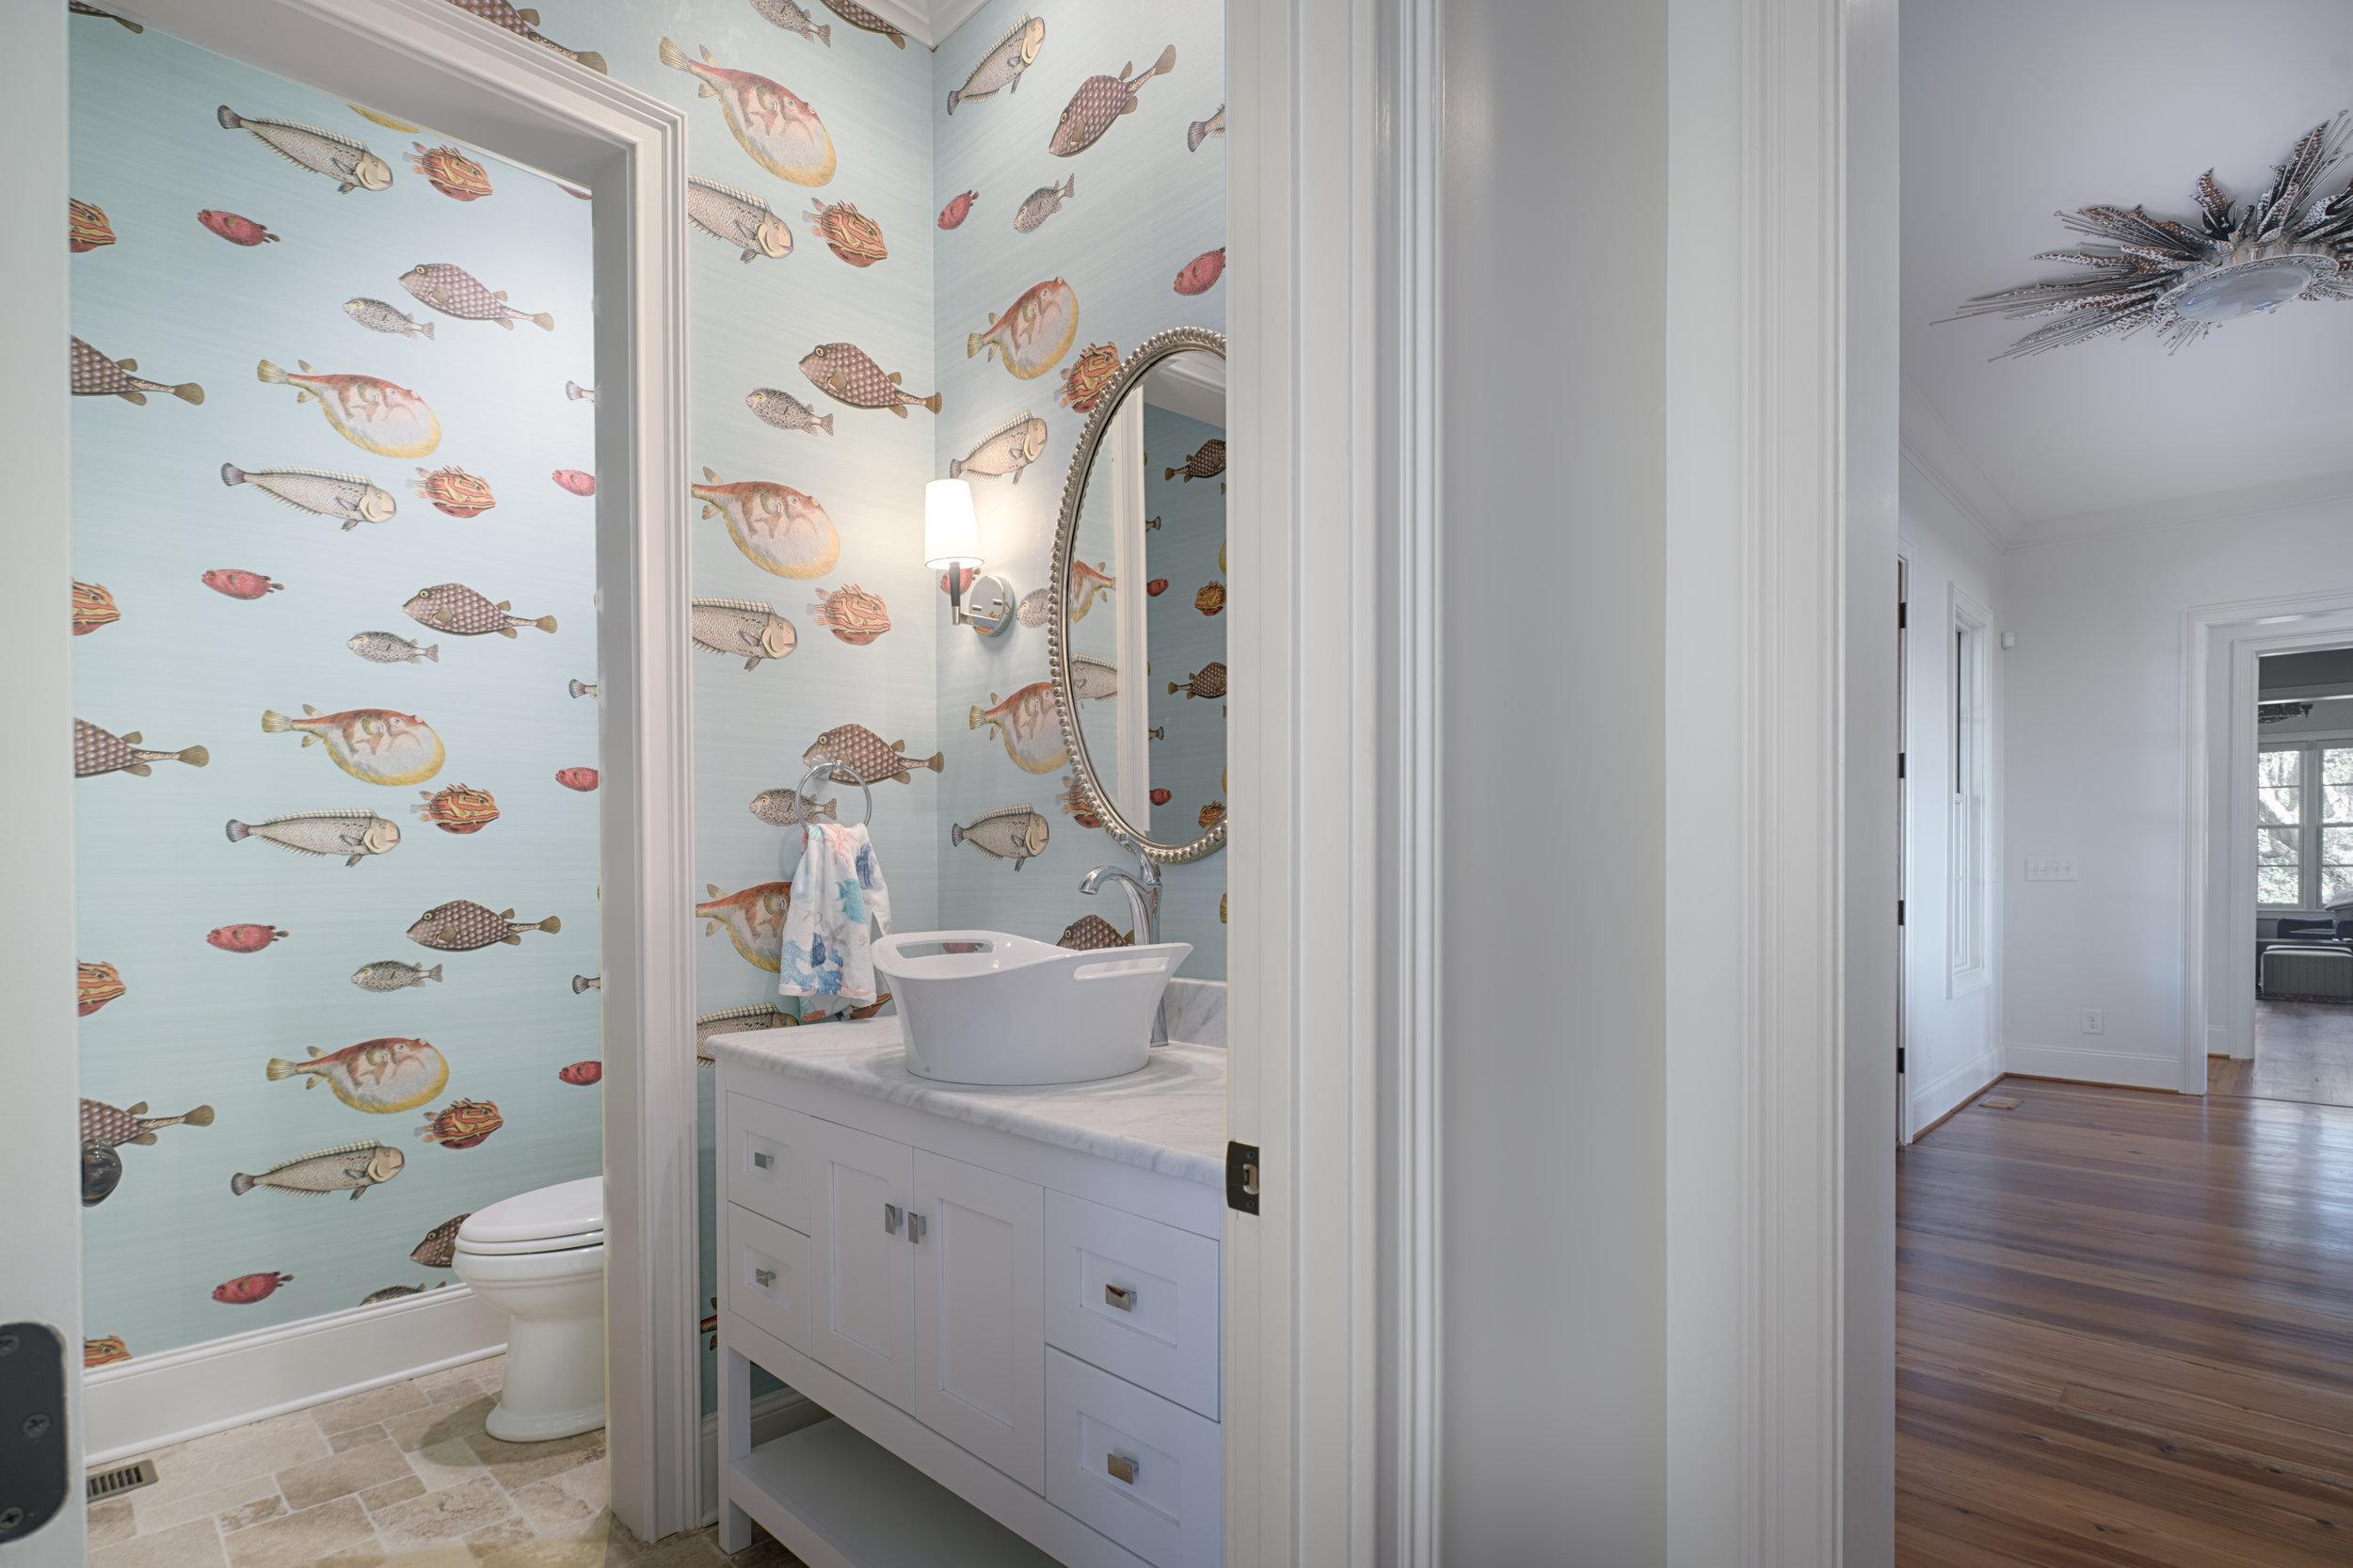 luvan fish paper.jpg